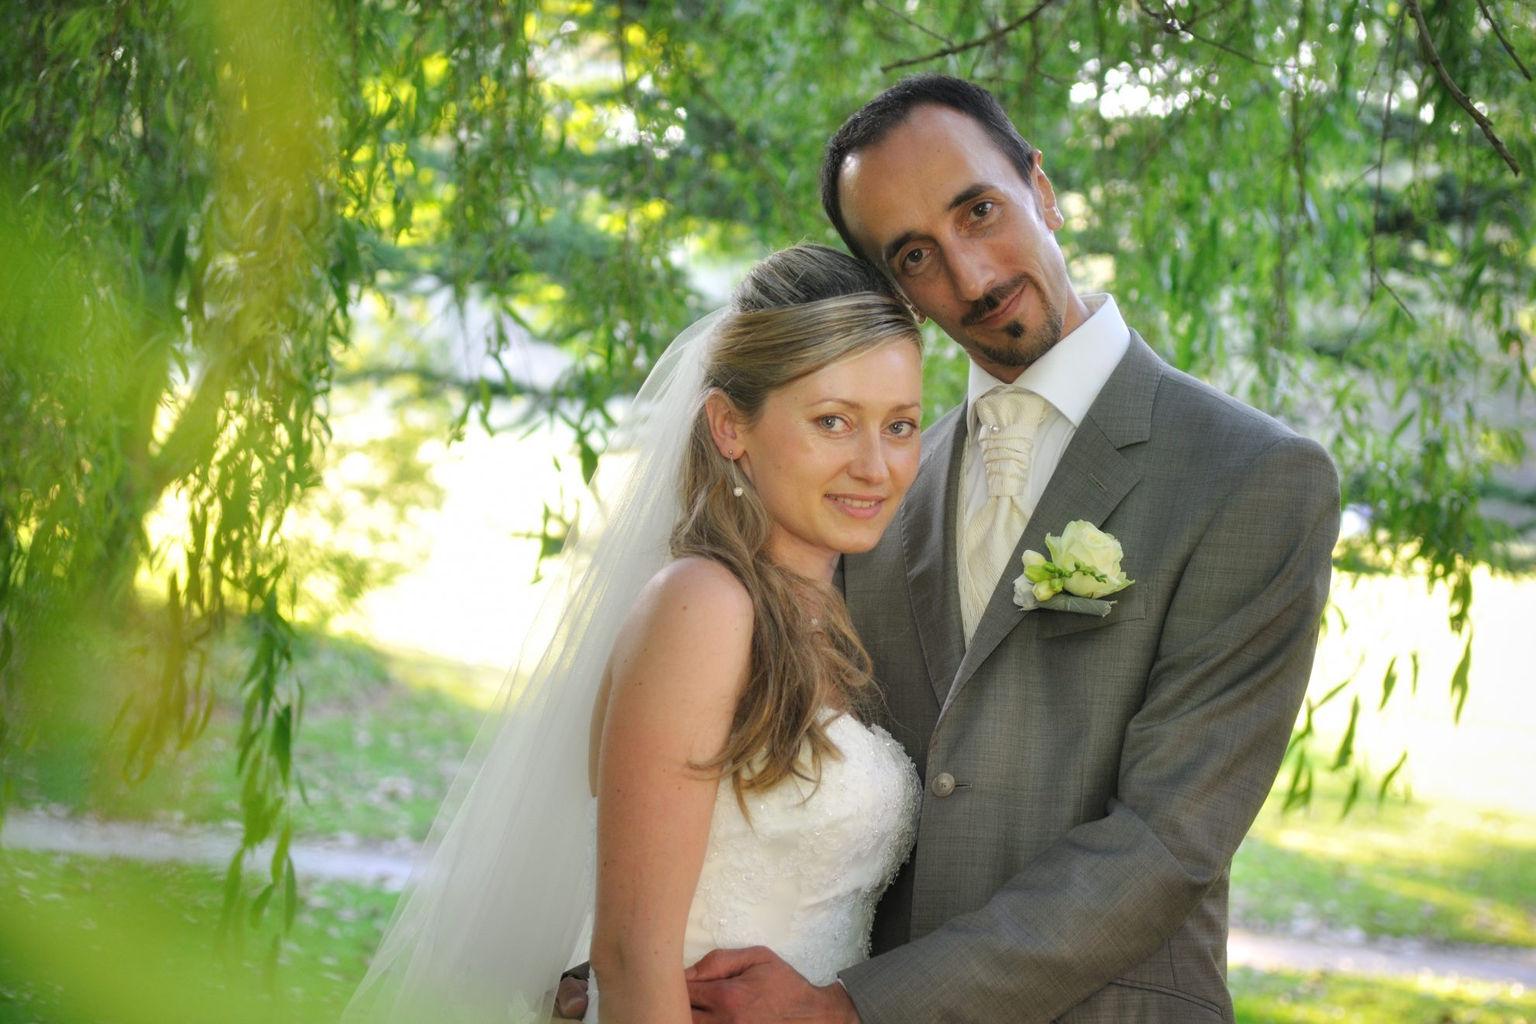 Photographe mariage axe etaples boulogne calais dunkerque - Mariage cote d opale ...